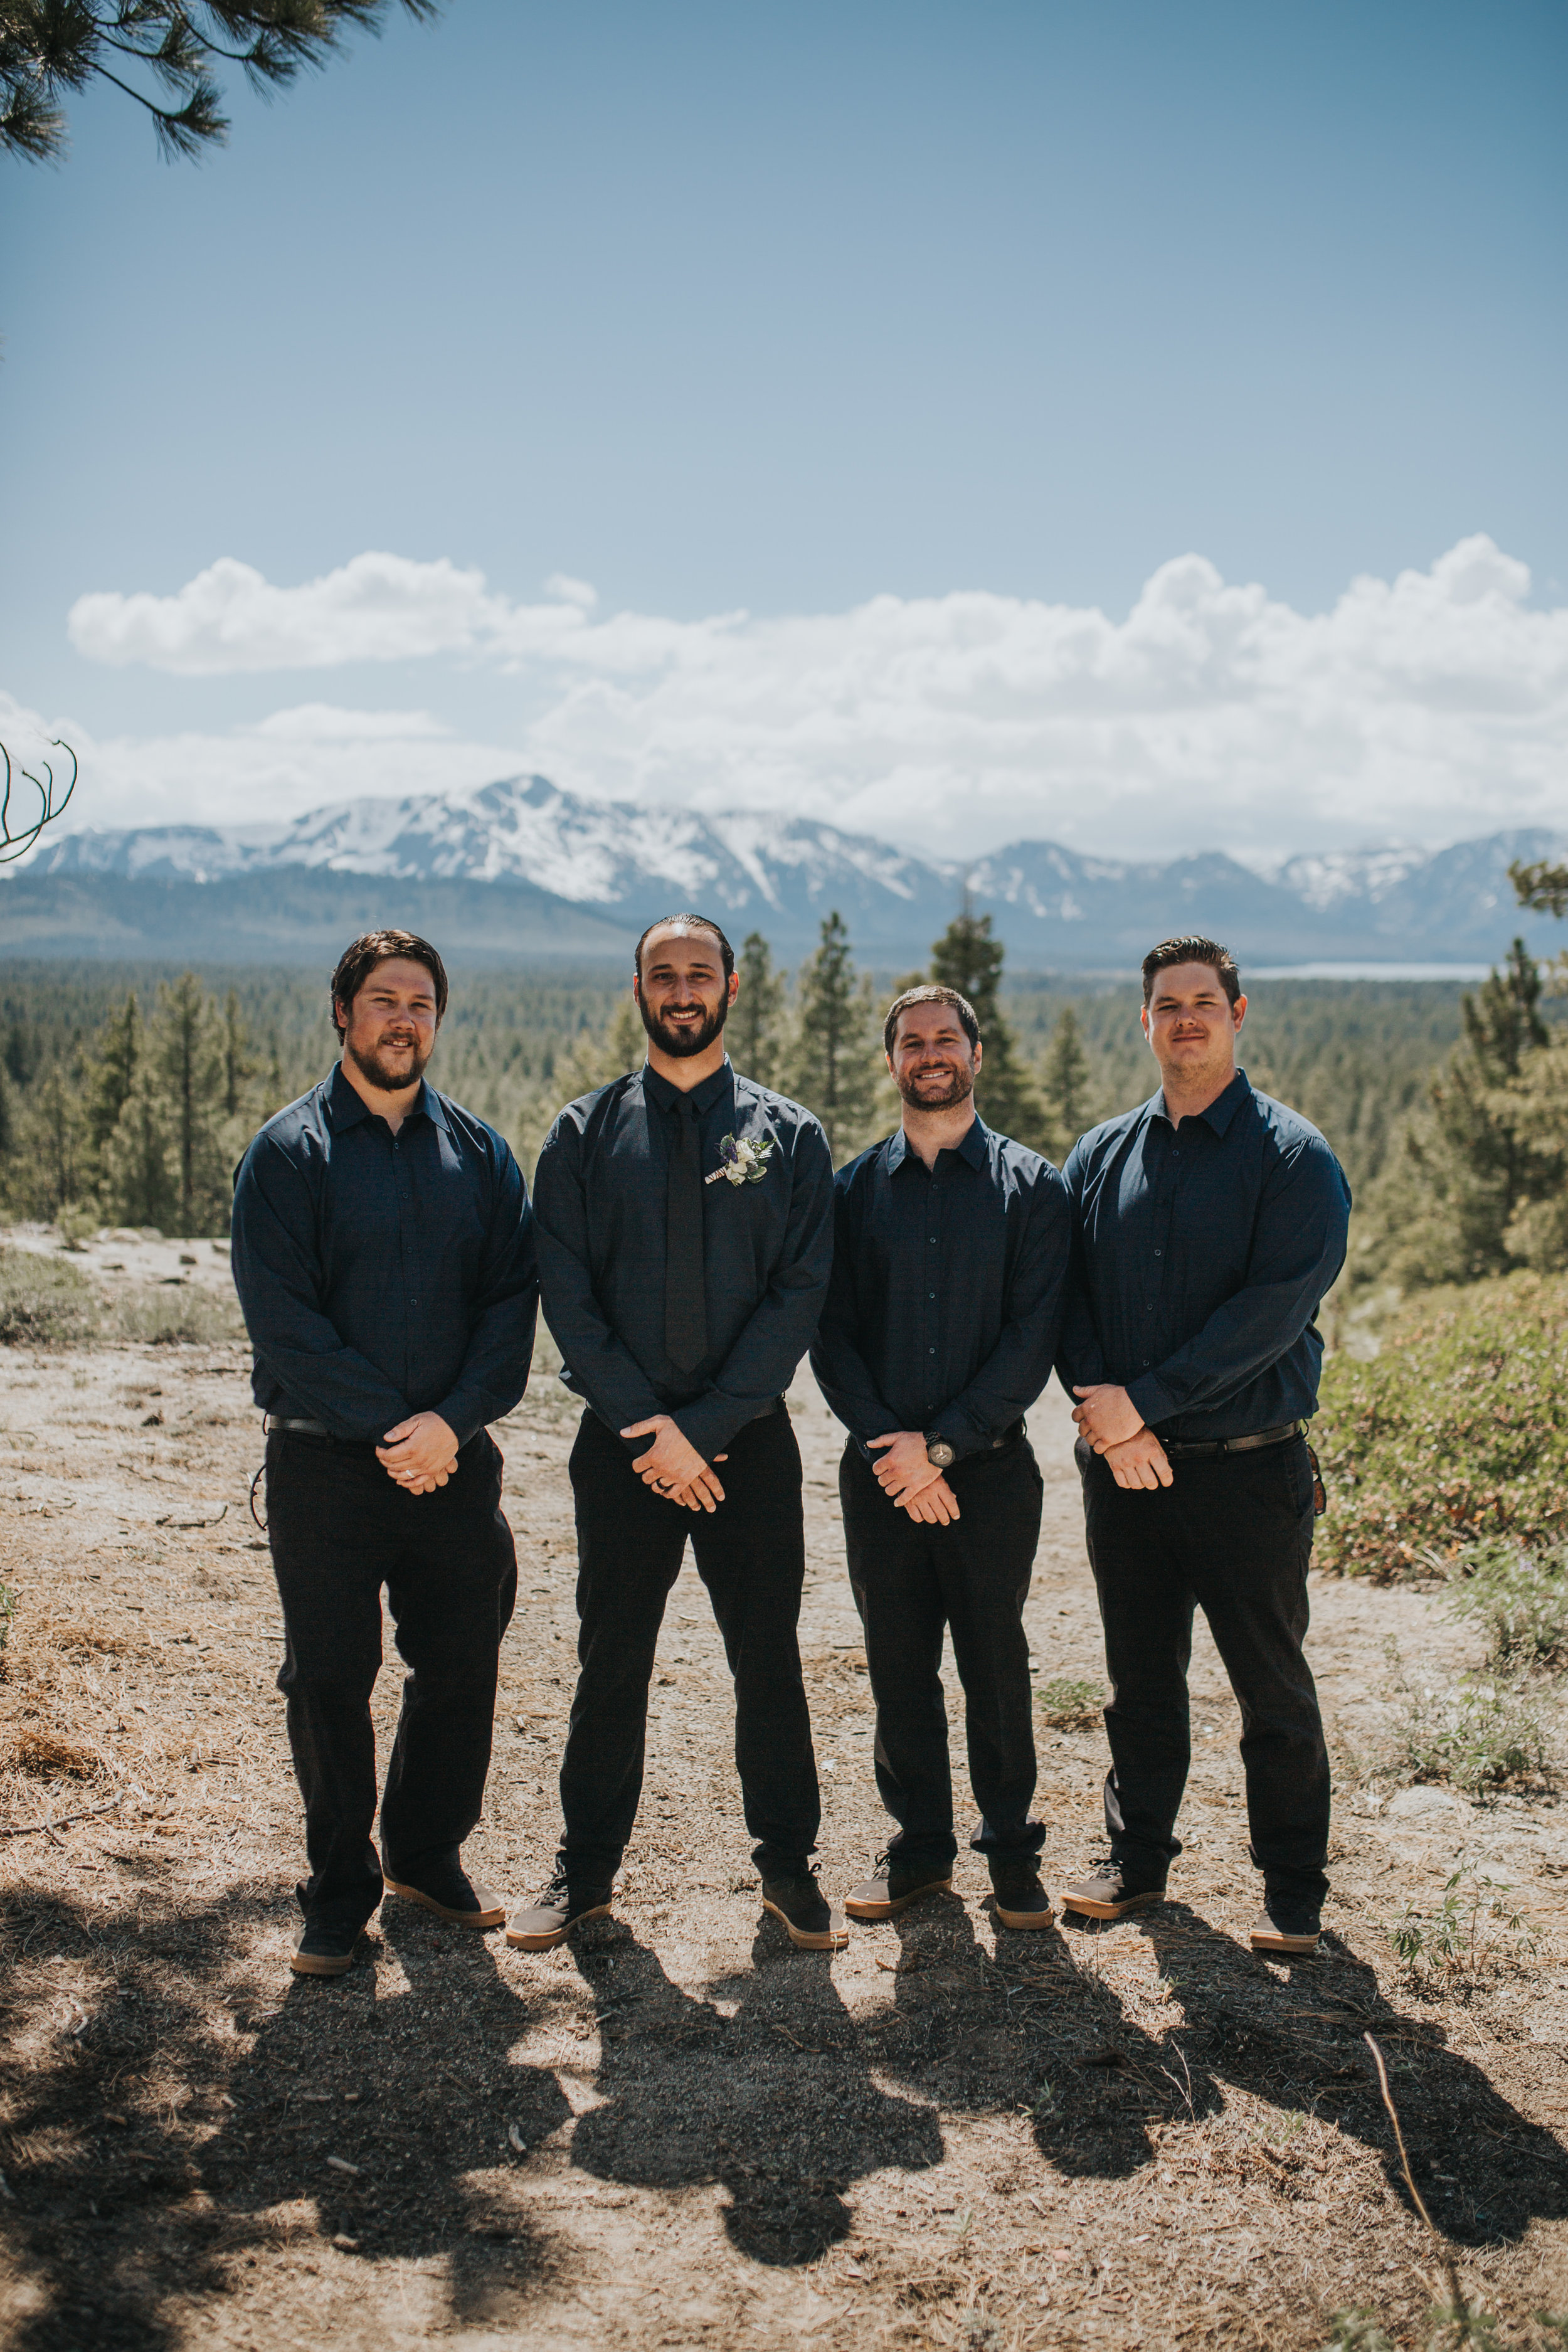 south-lake-tahoe-elopement-valerie-lendvay-photo-038.jpg